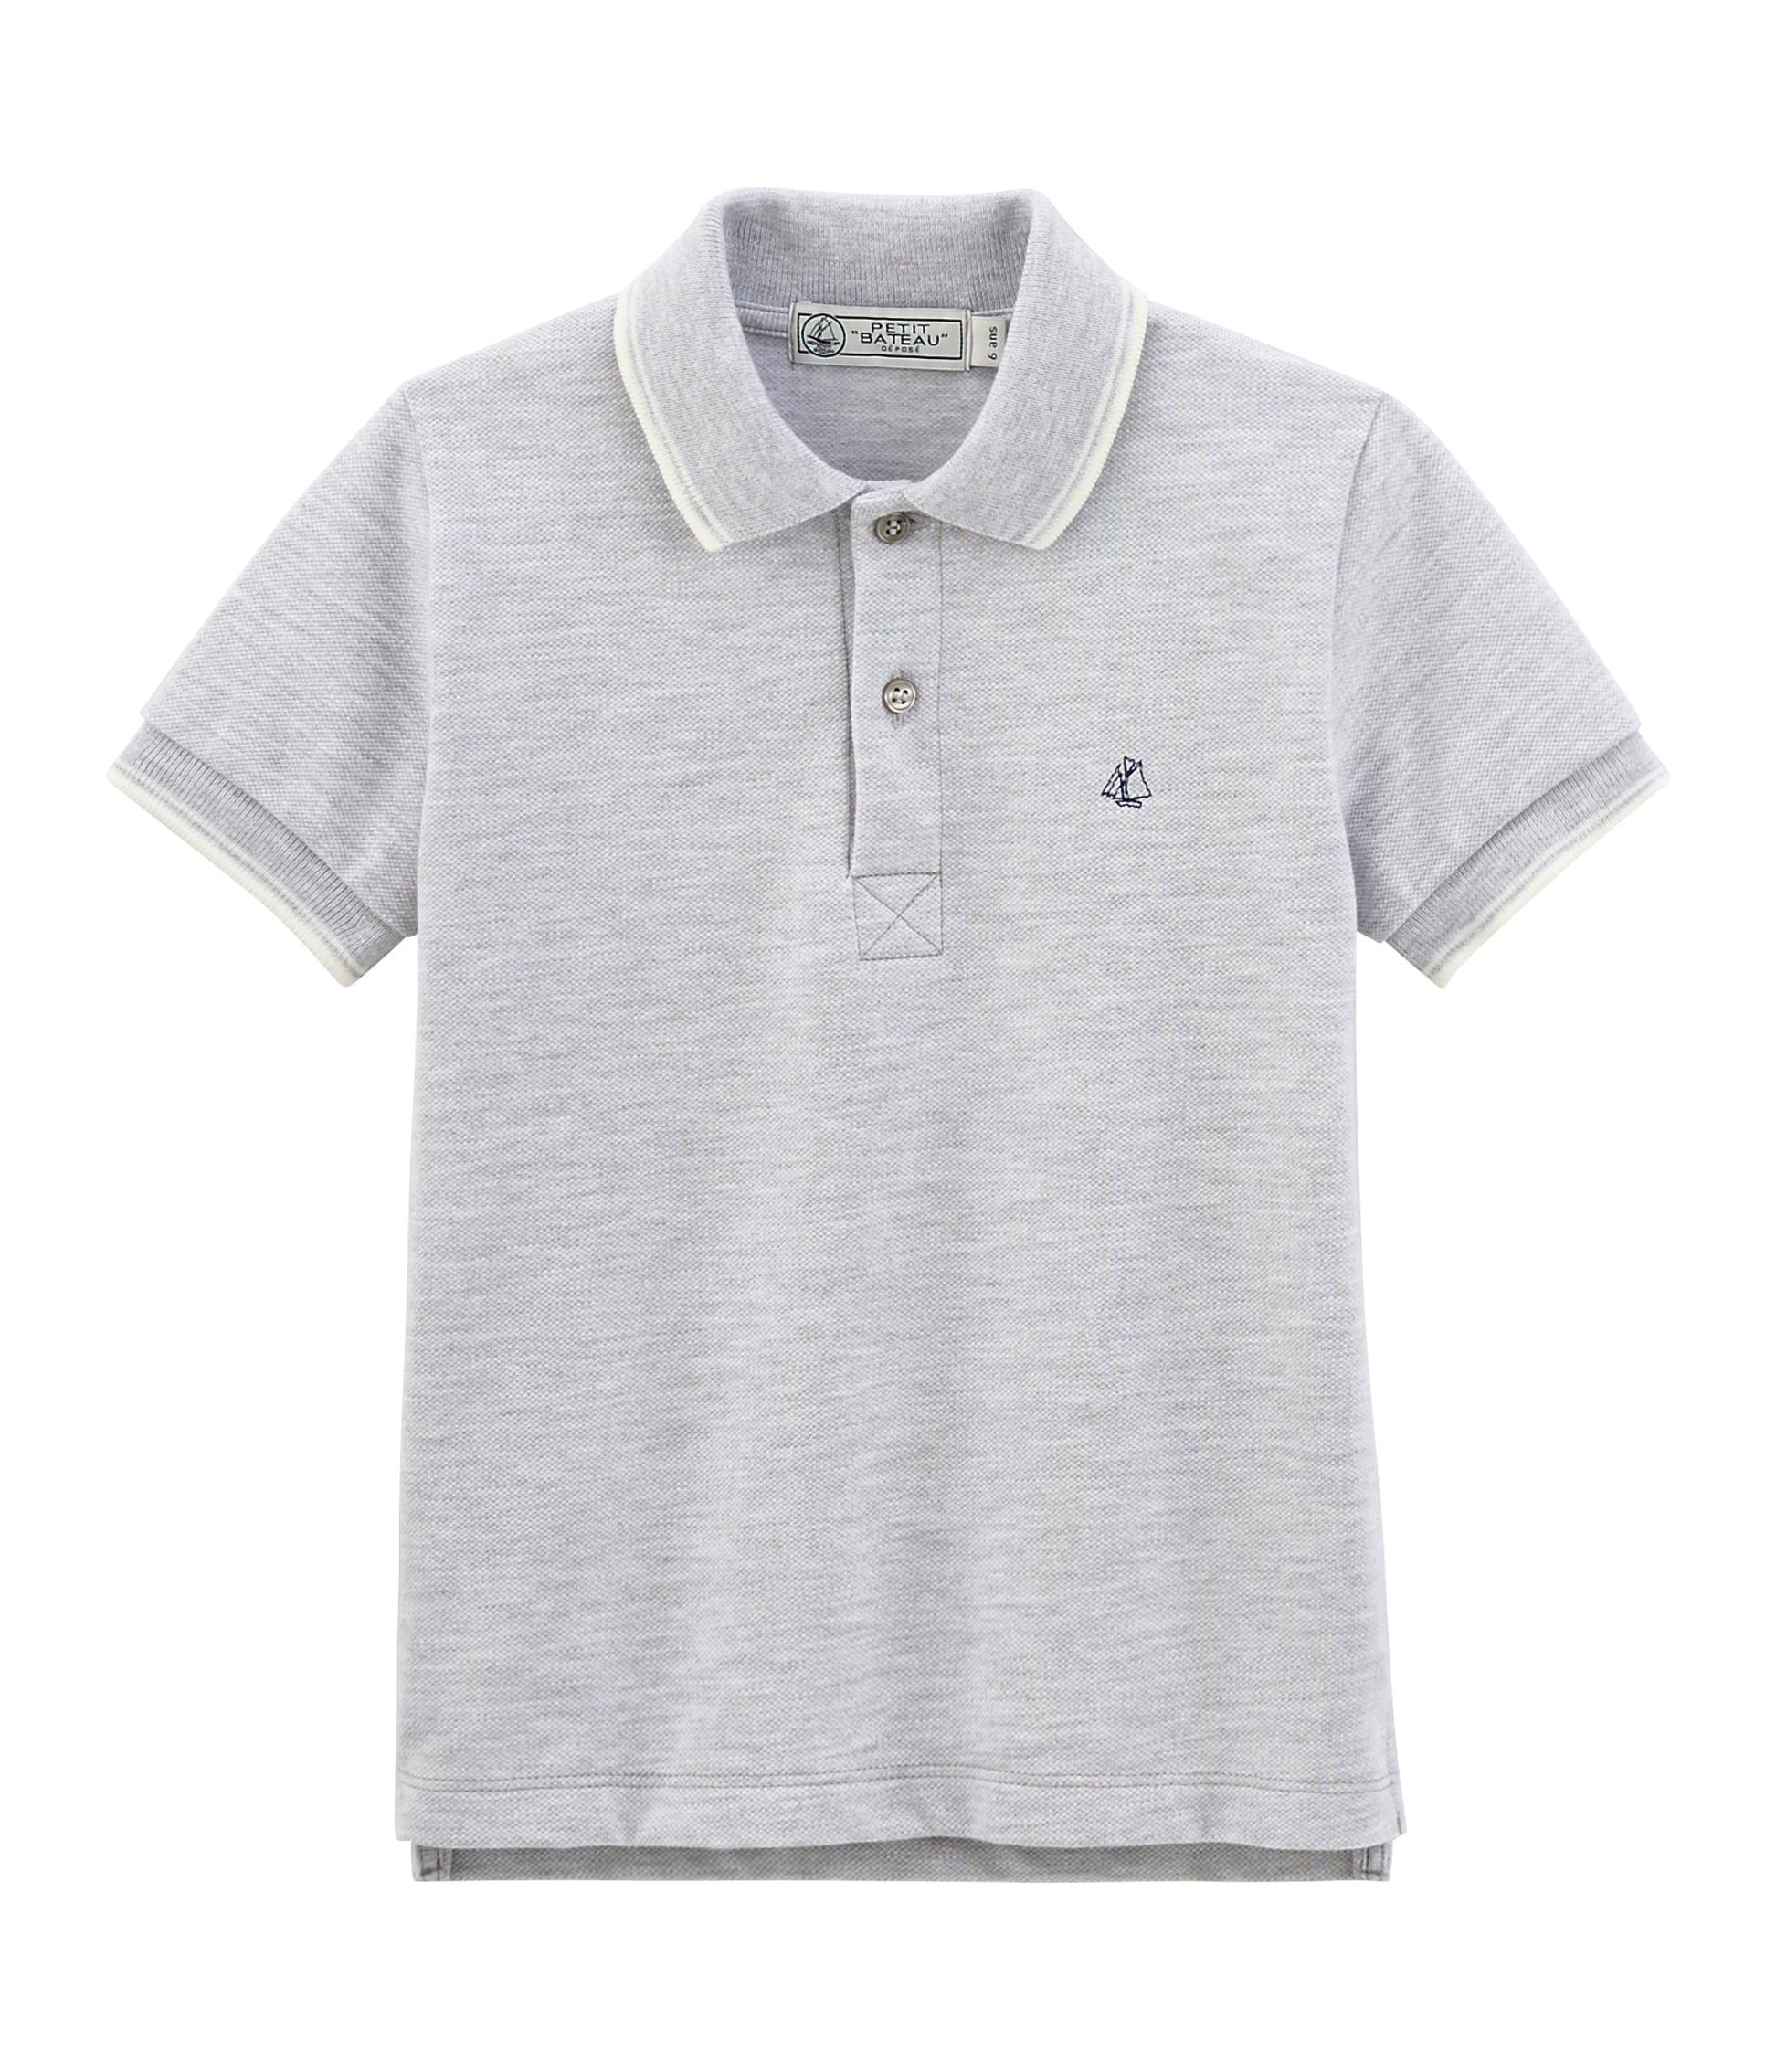 93f3641eda Boys' Short-sleeved Polo Shirt | Petit Bateau